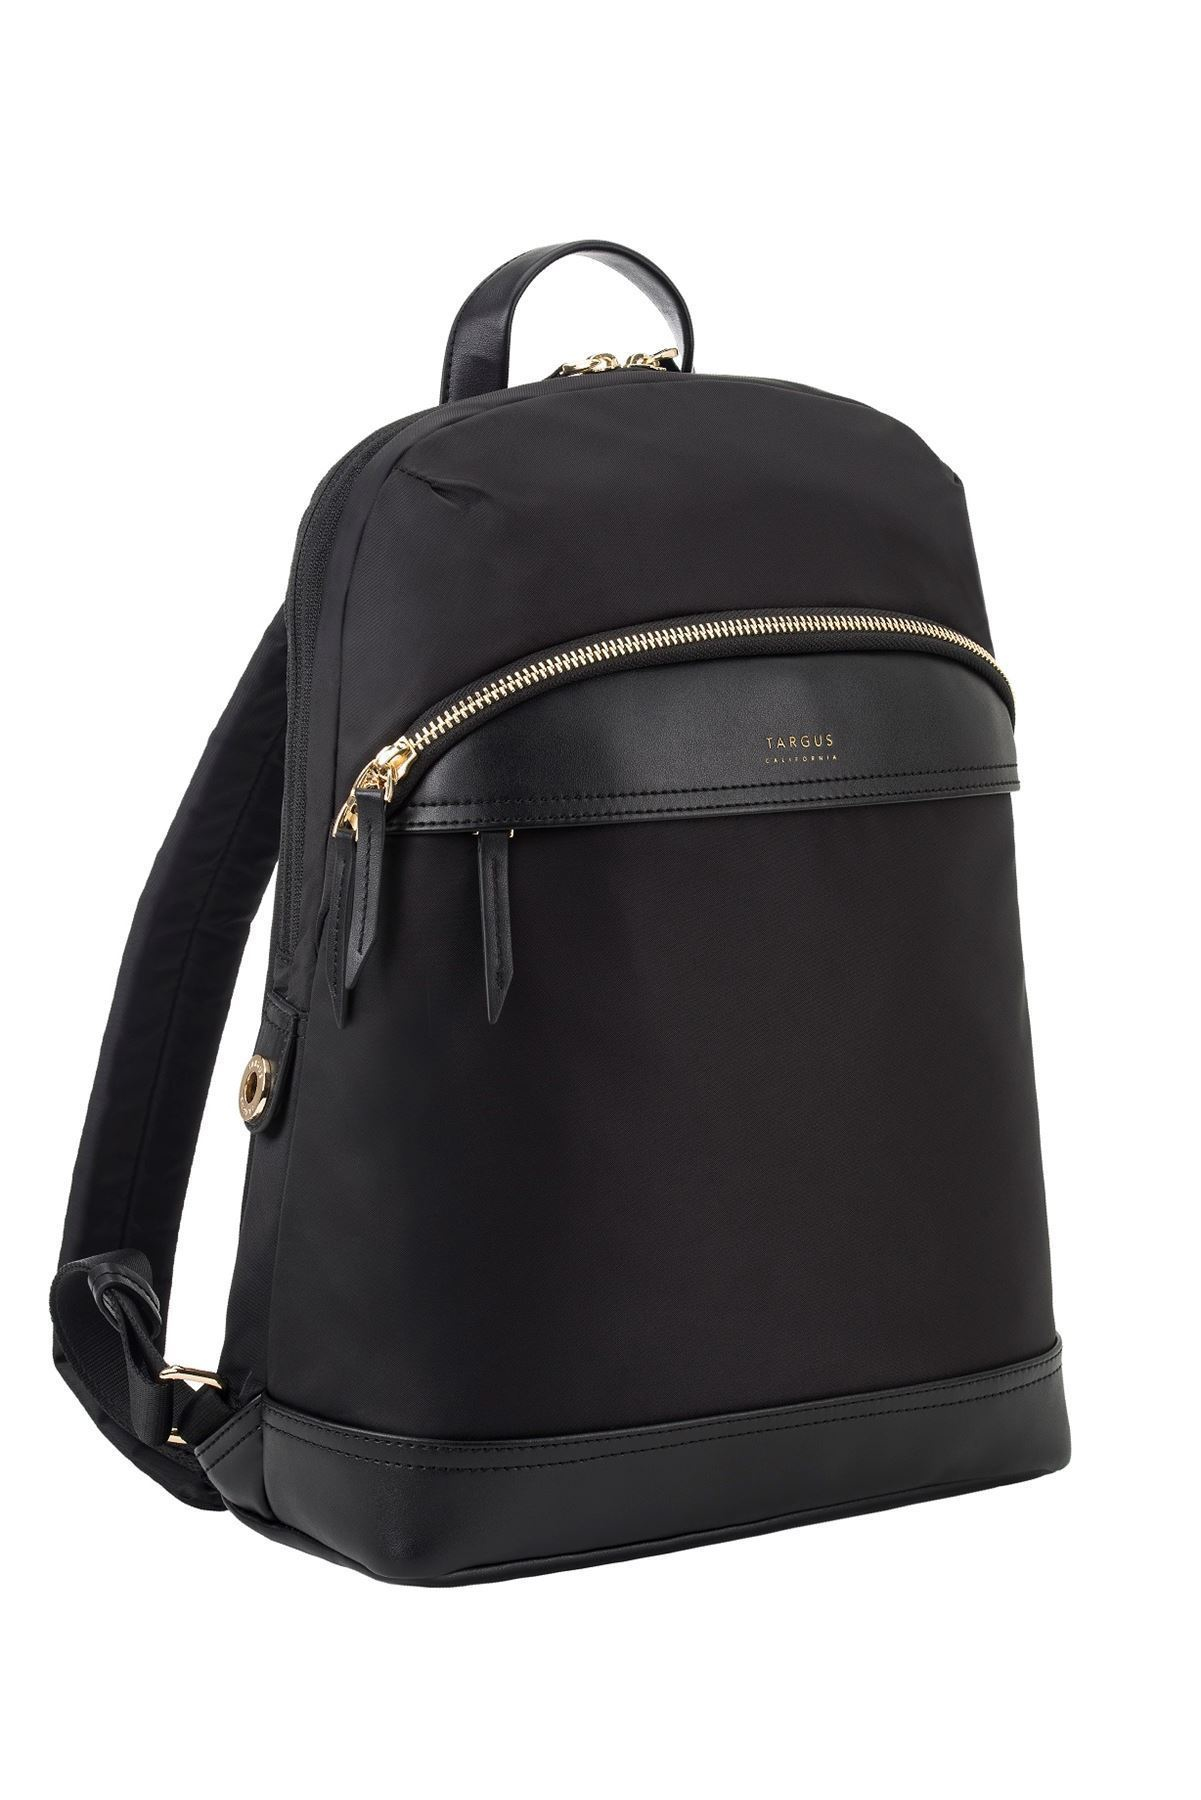 "Targus Newport maletines para portátil 32,8 cm (12.9"") Mochila Negro"